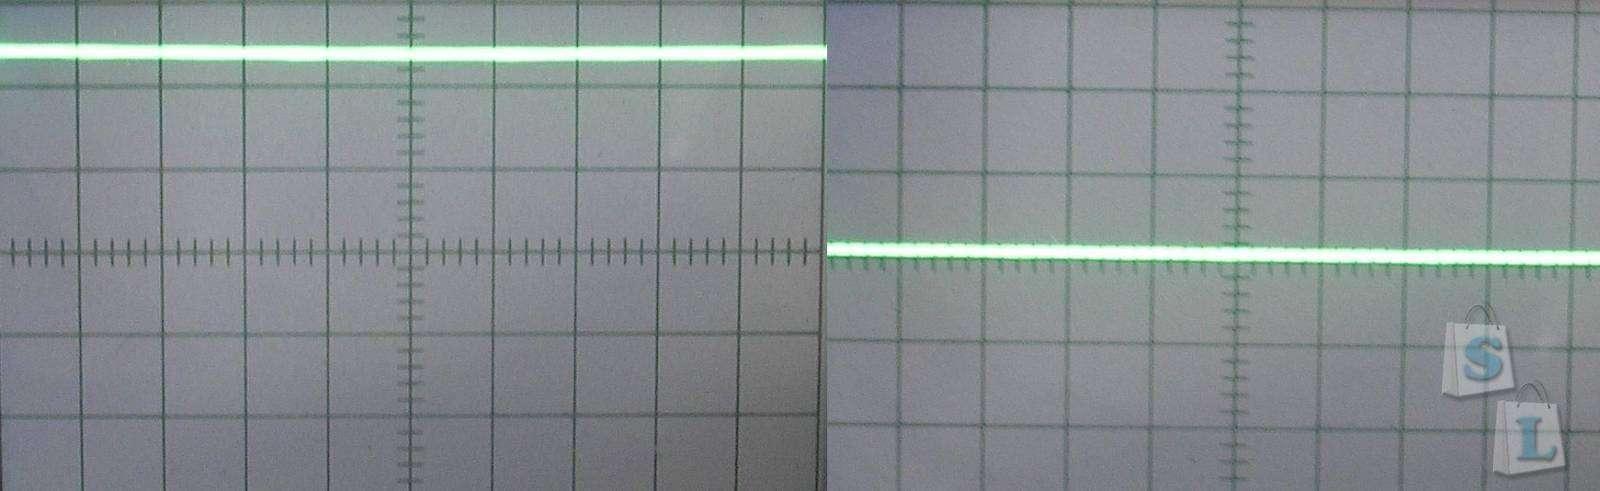 EachBuyer: Лампочка на 9W E27 58 SMD2835 LED Corn